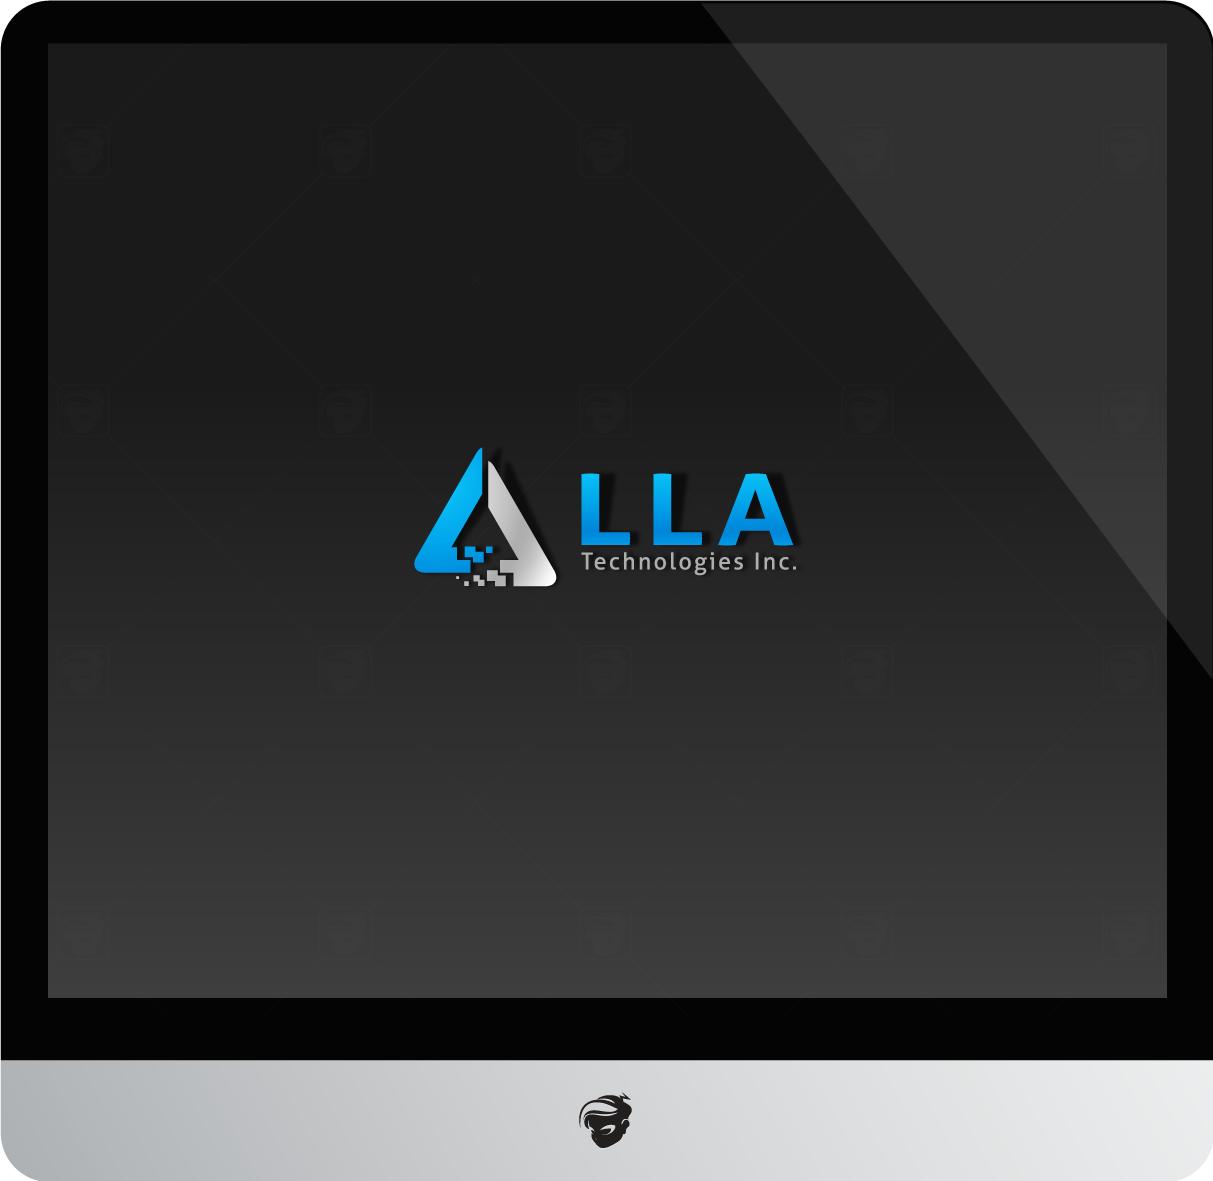 Logo Design by zesthar - Entry No. 149 in the Logo Design Contest Inspiring Logo Design for LLA Technologies Inc..